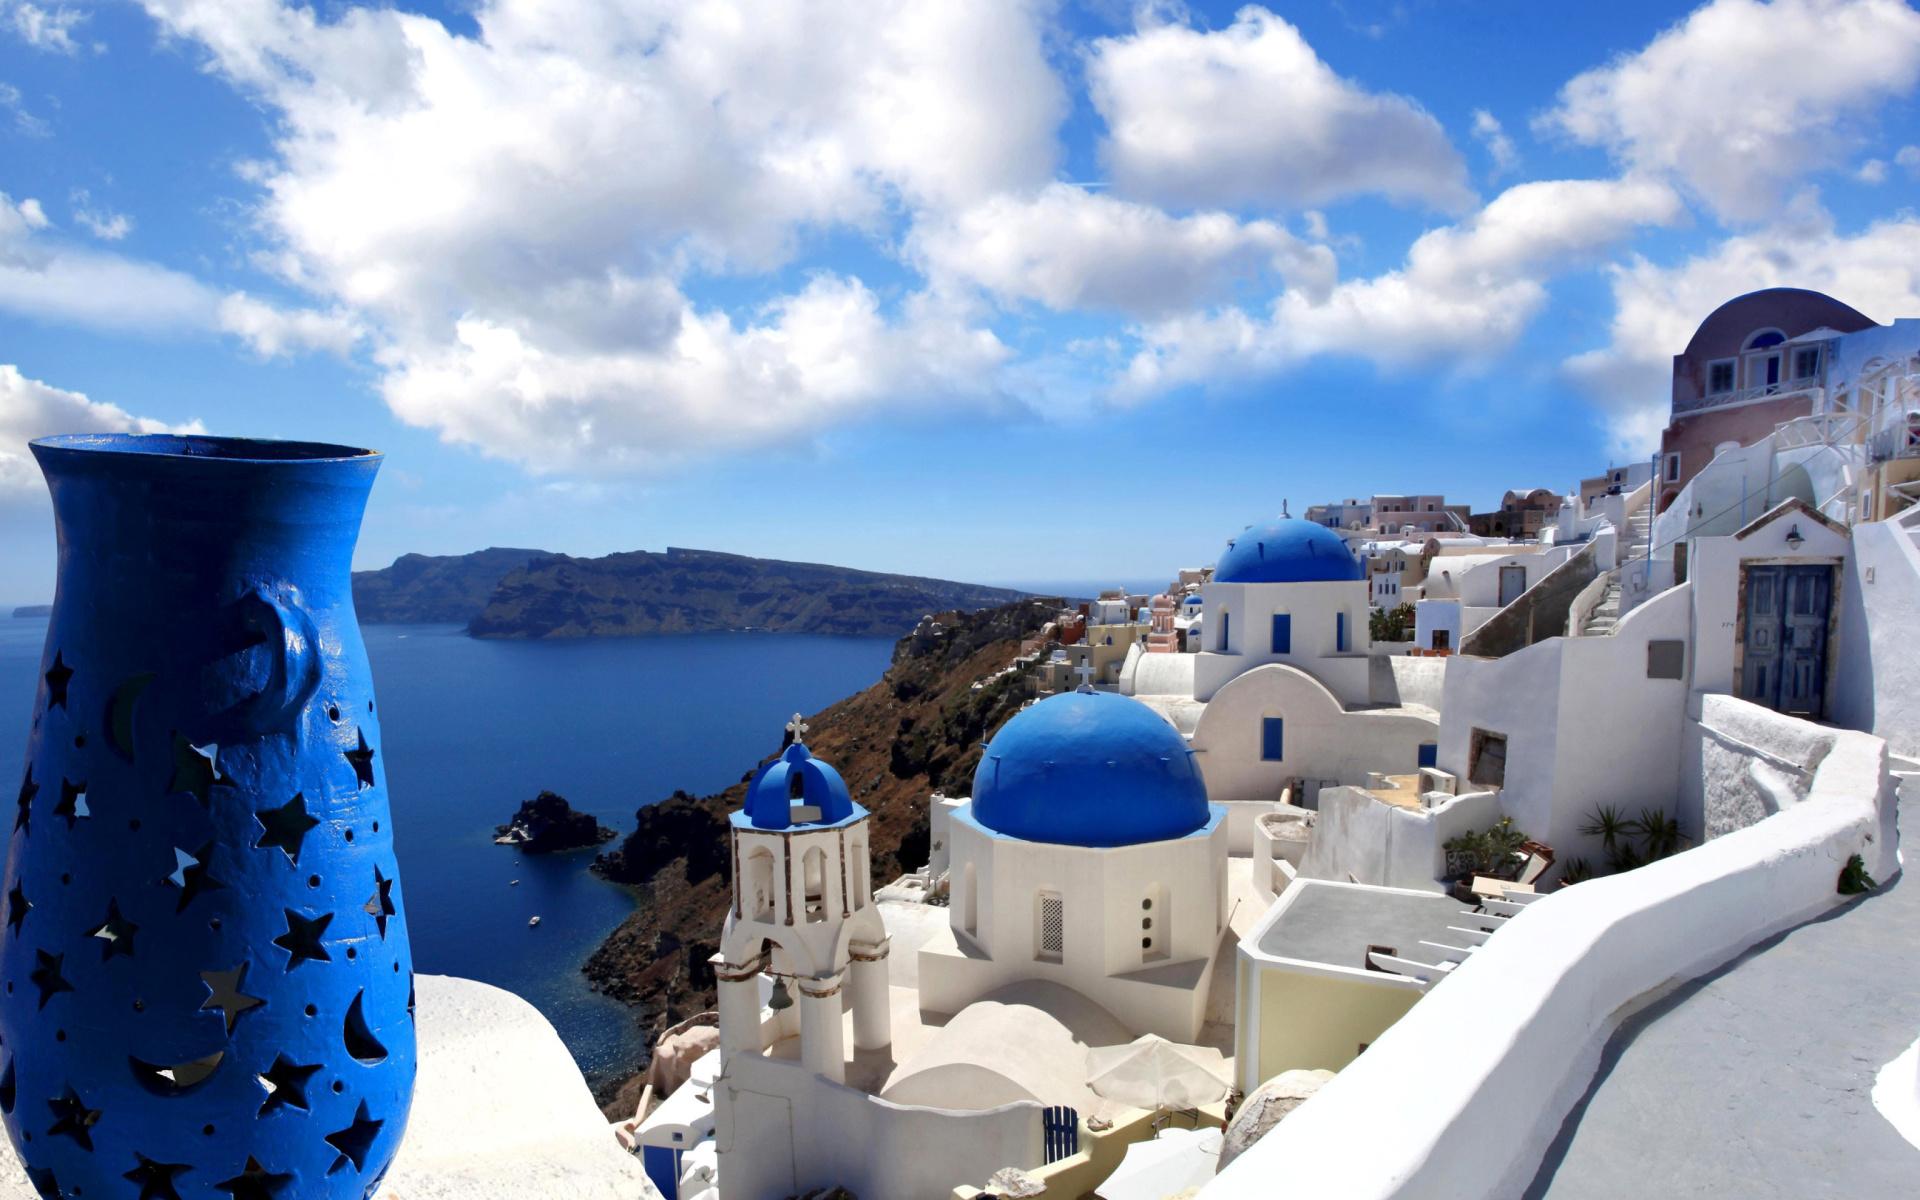 wallpaper santorini greece island - photo #20